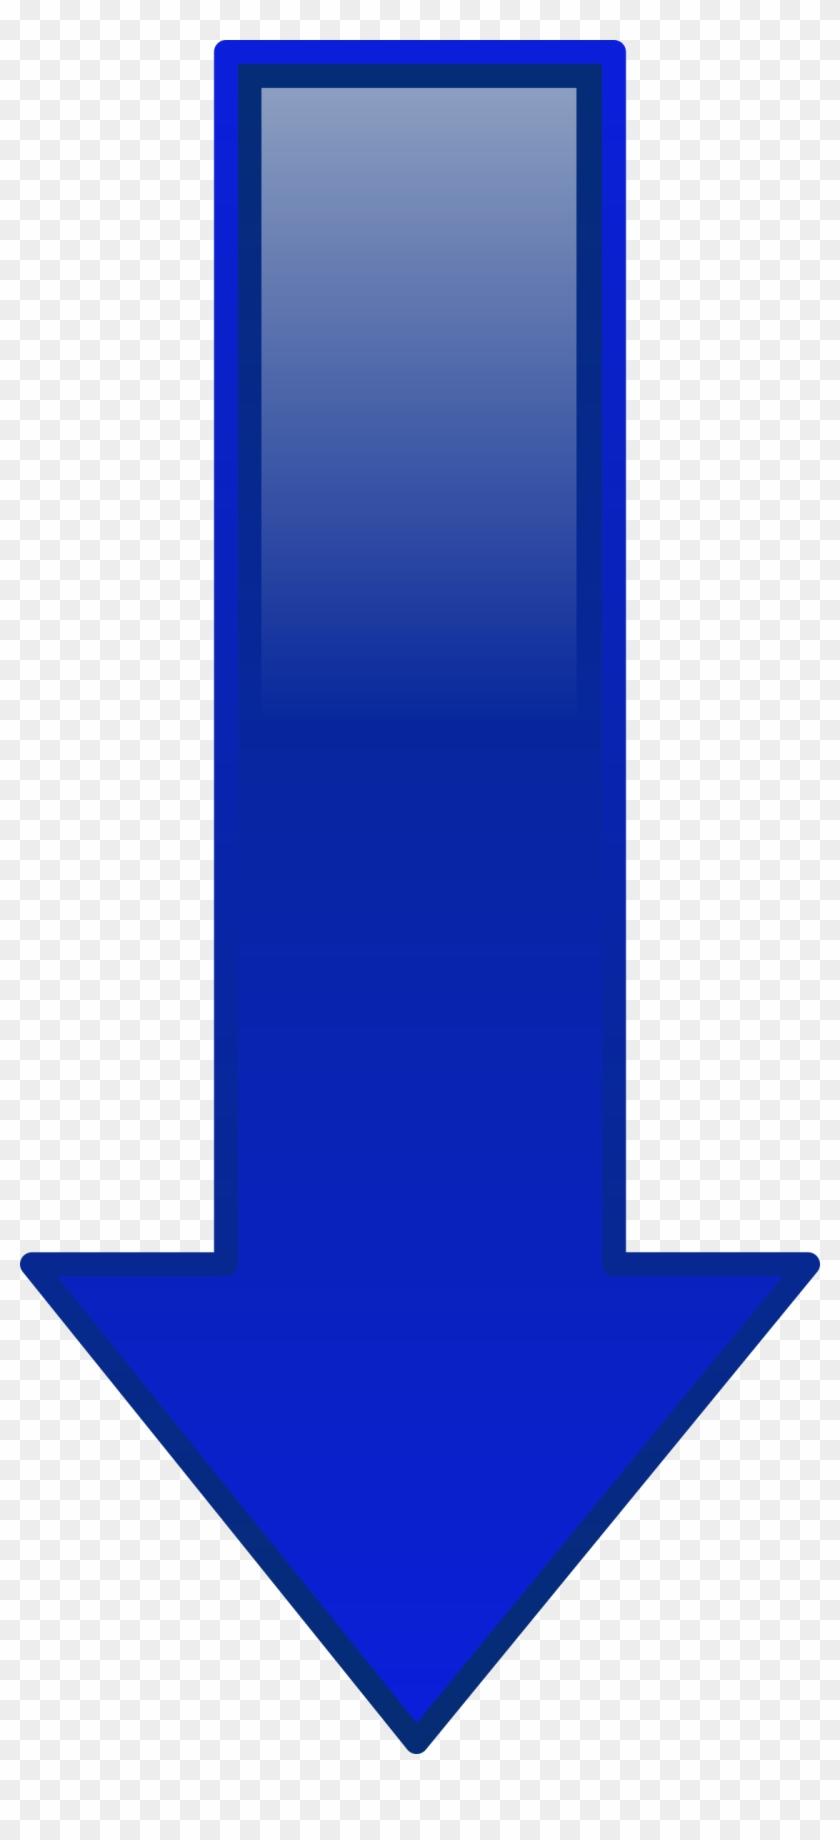 Free Vector Arrow Down Blue Clip Art - Blue Down Arrow Jpg #50181